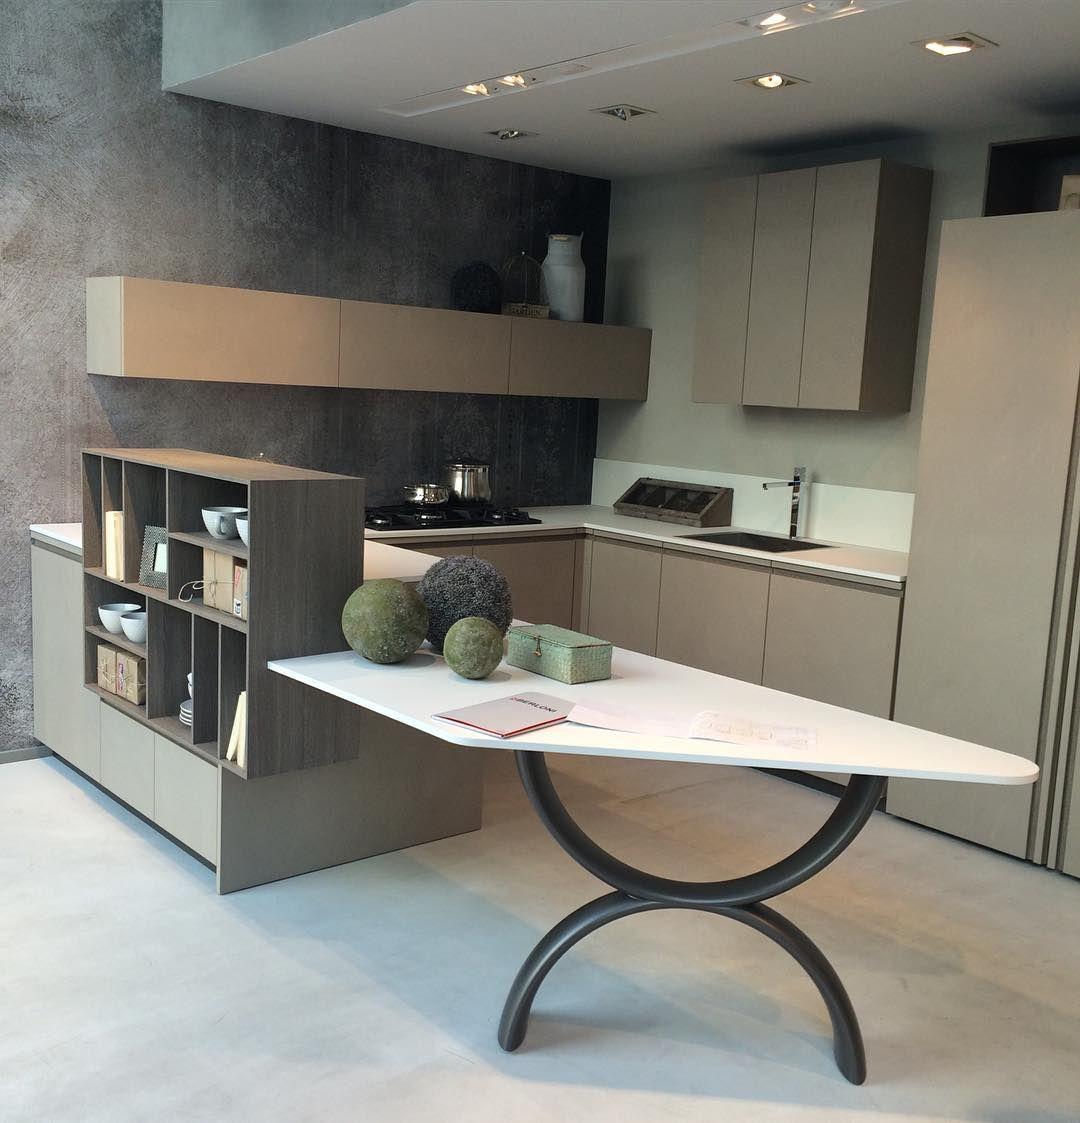 Berloni kitchen #furniture#berloni#kitchen#milano#design#week ...